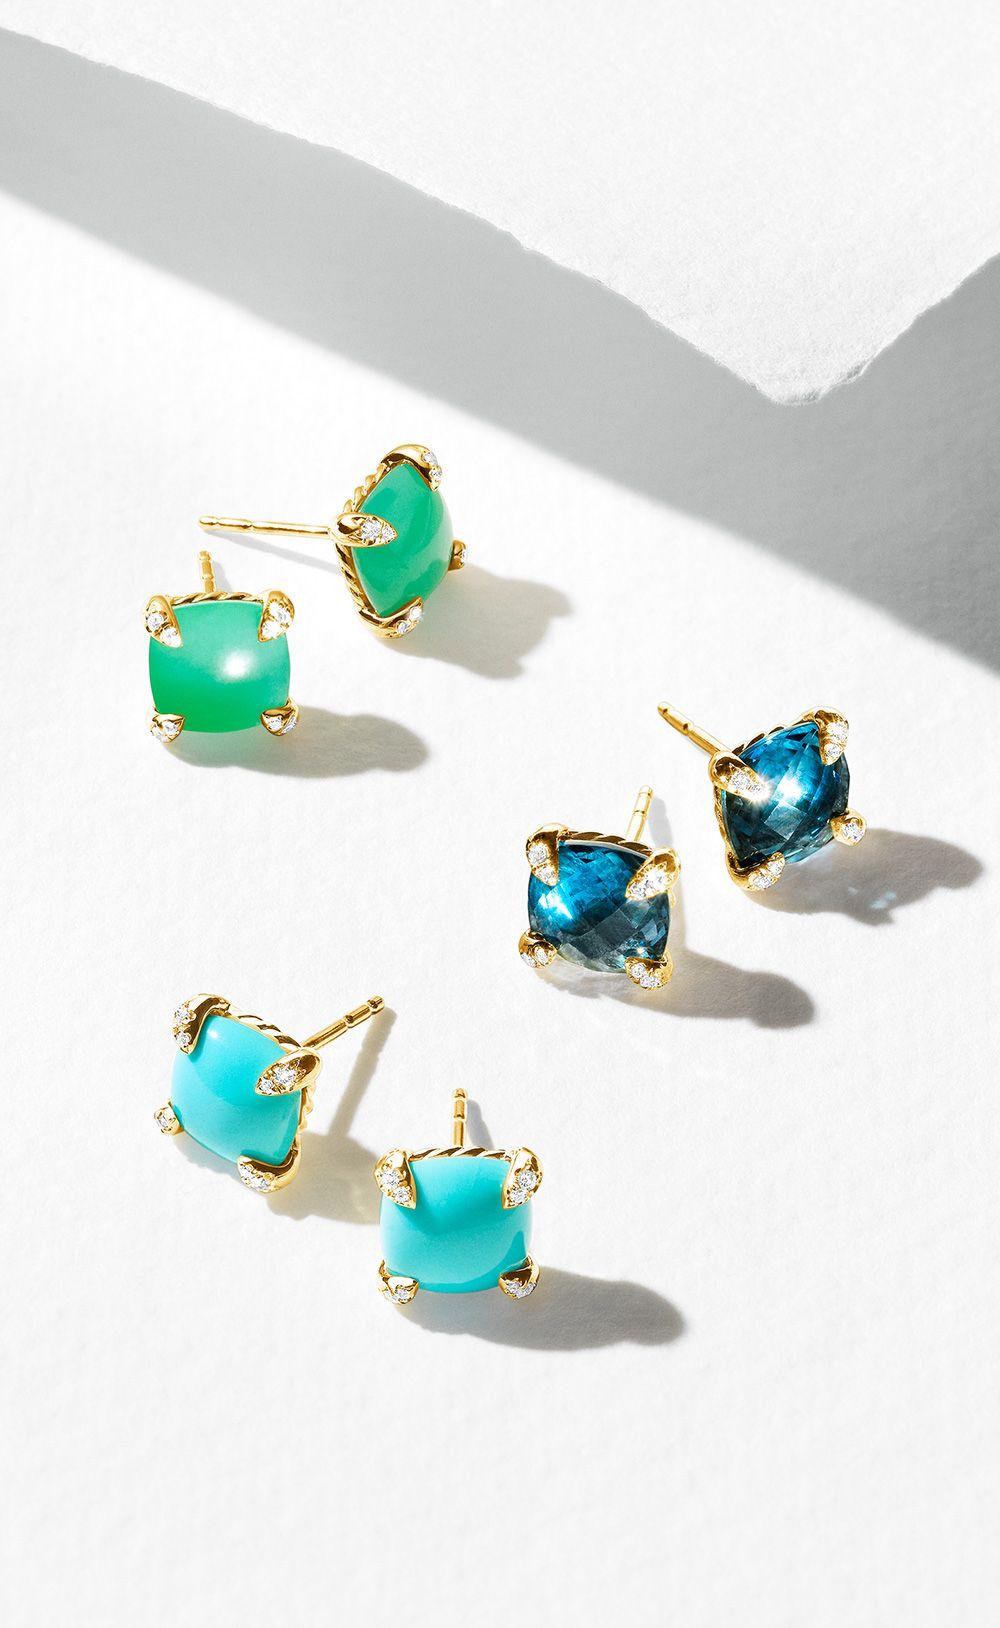 Chtelaine studs with chrysoprase Hampton blue topaz or turquoise